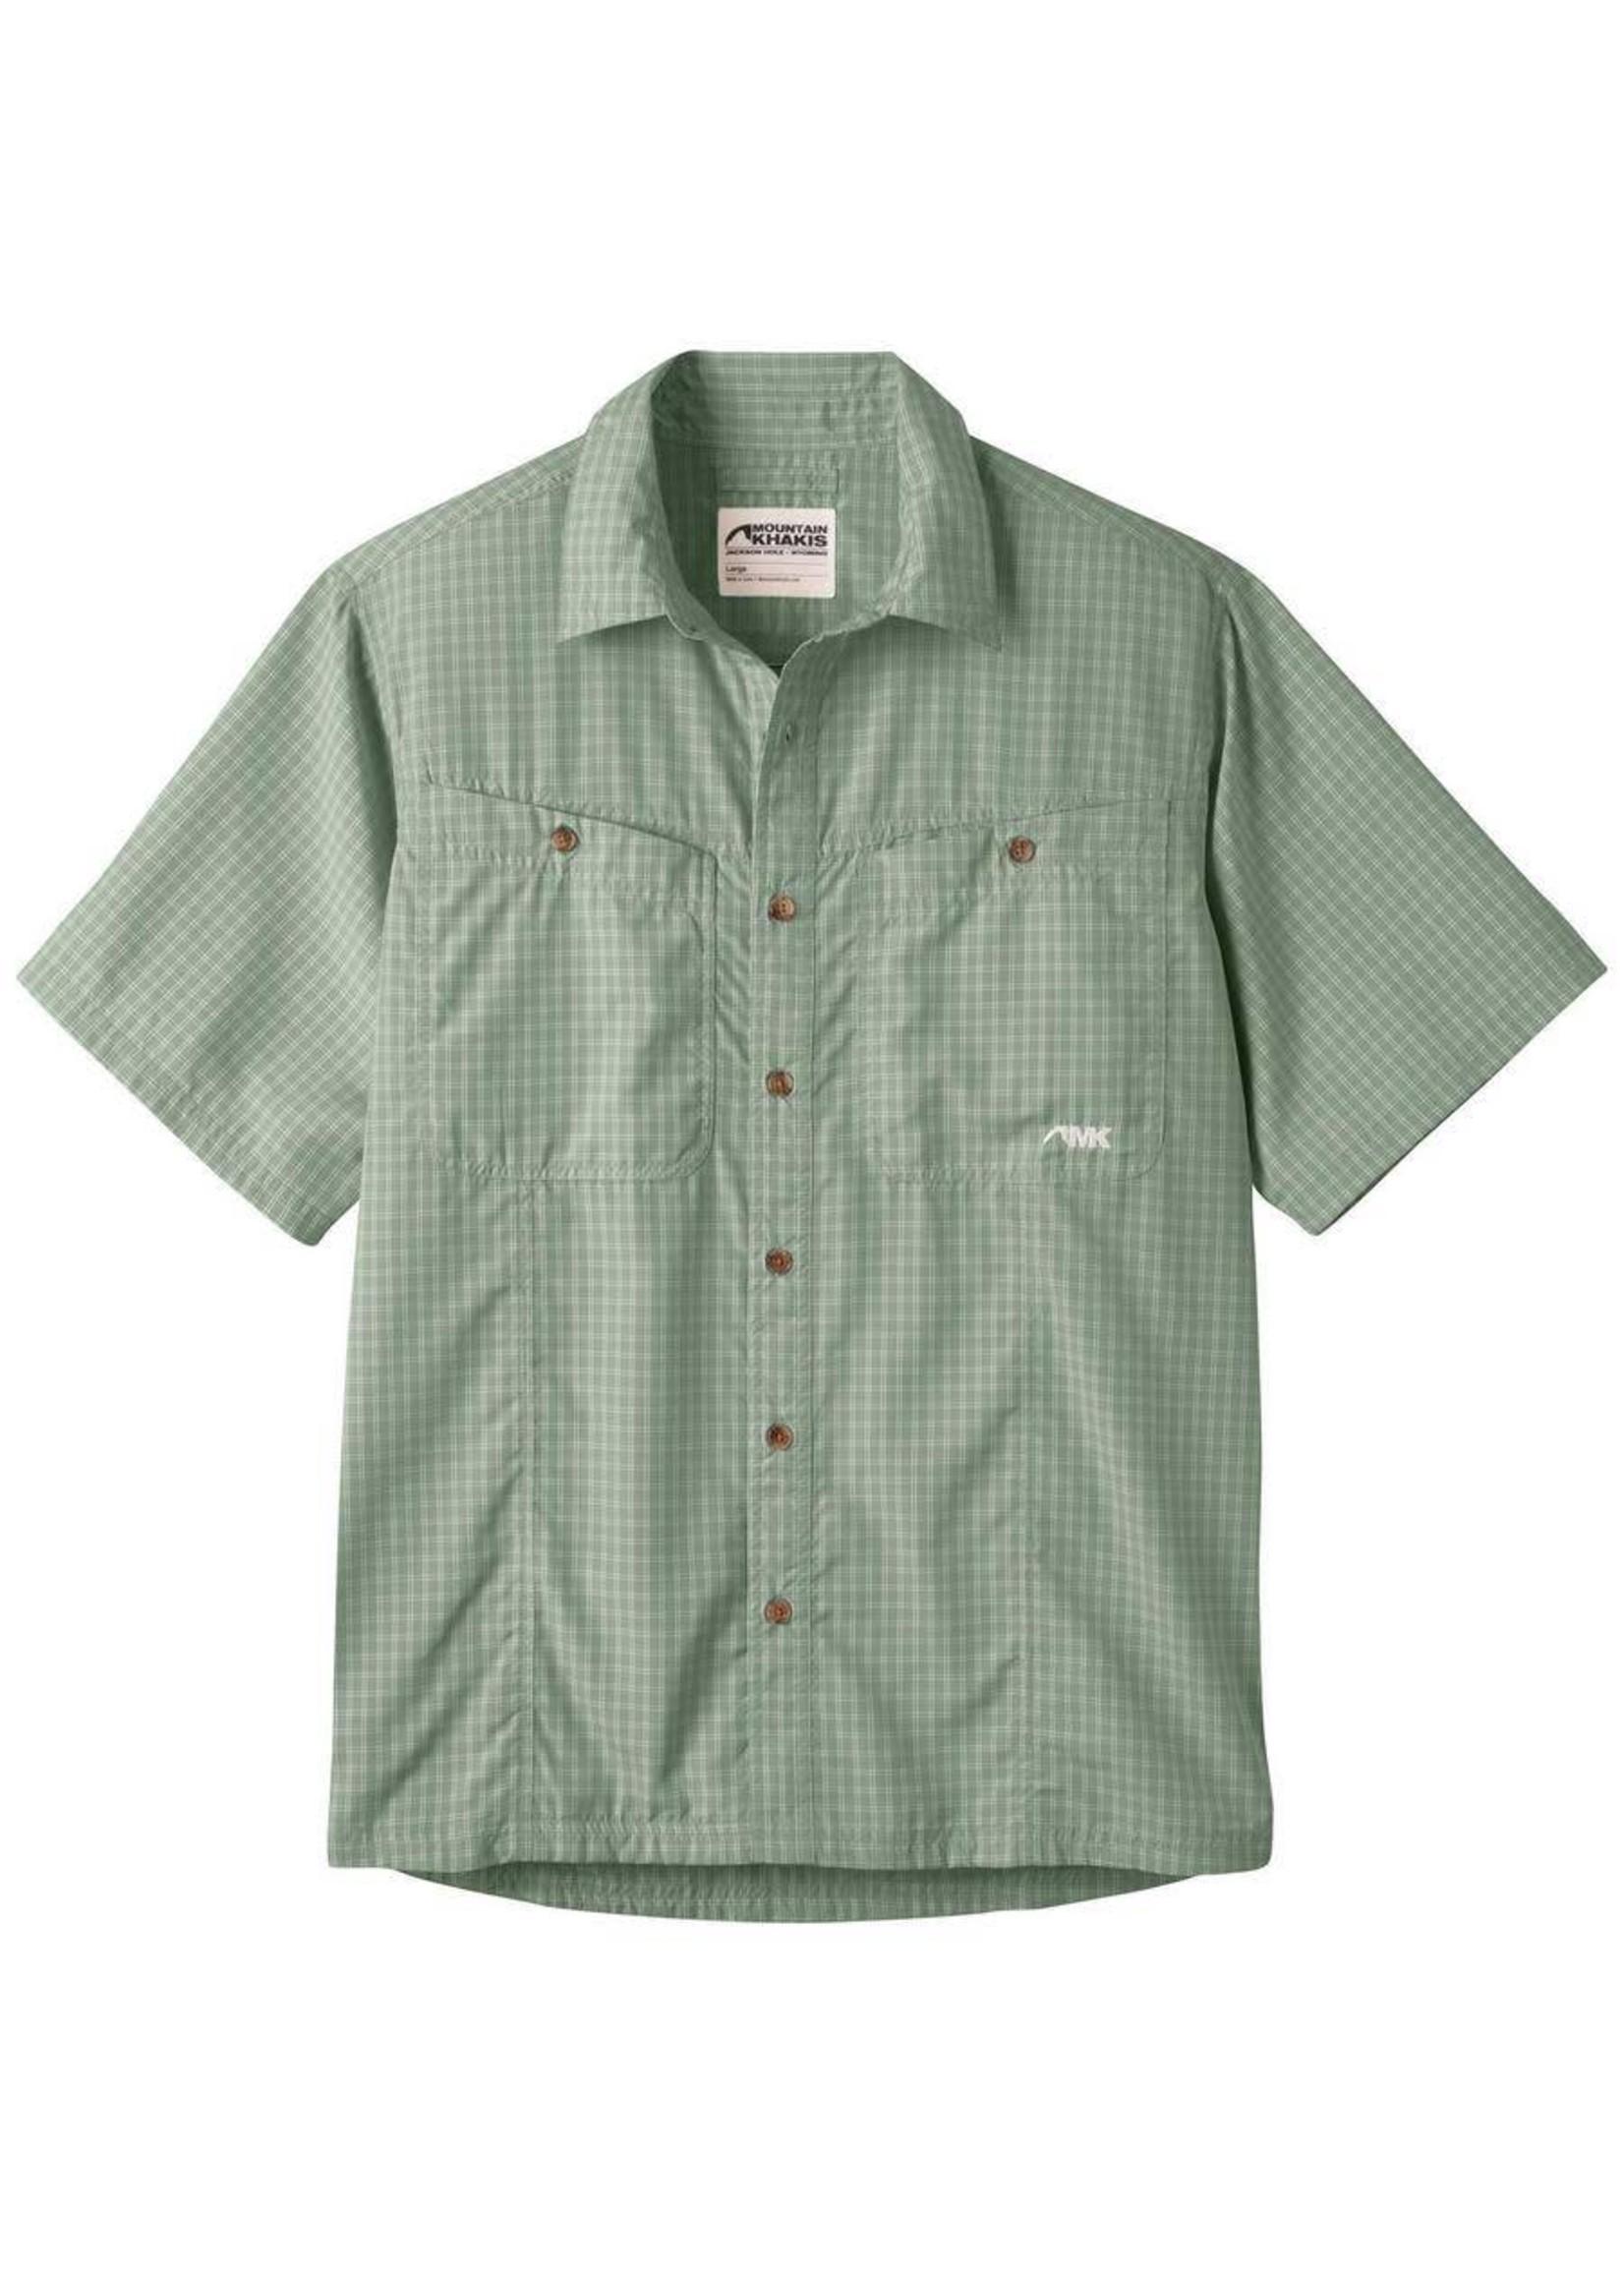 Mountain Khakis Trail Creek Short Sleeve Shirt